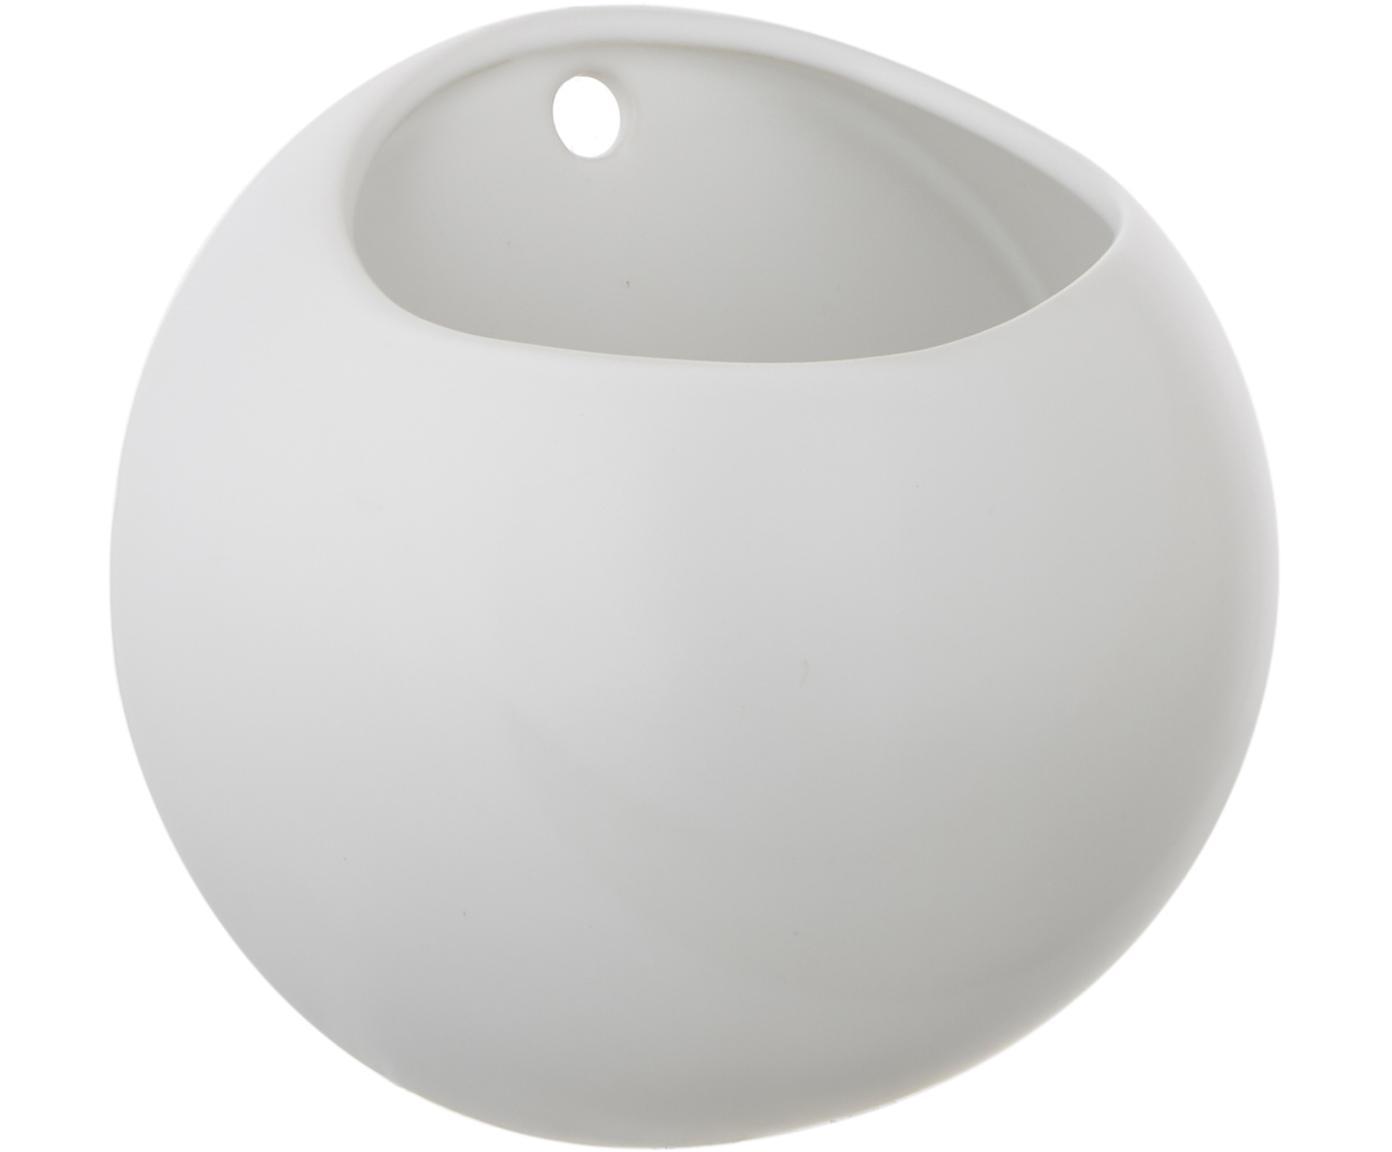 Portavaso da parete Globe, Ceramica, Bianco, Ø 15 x Alt. 10 cm